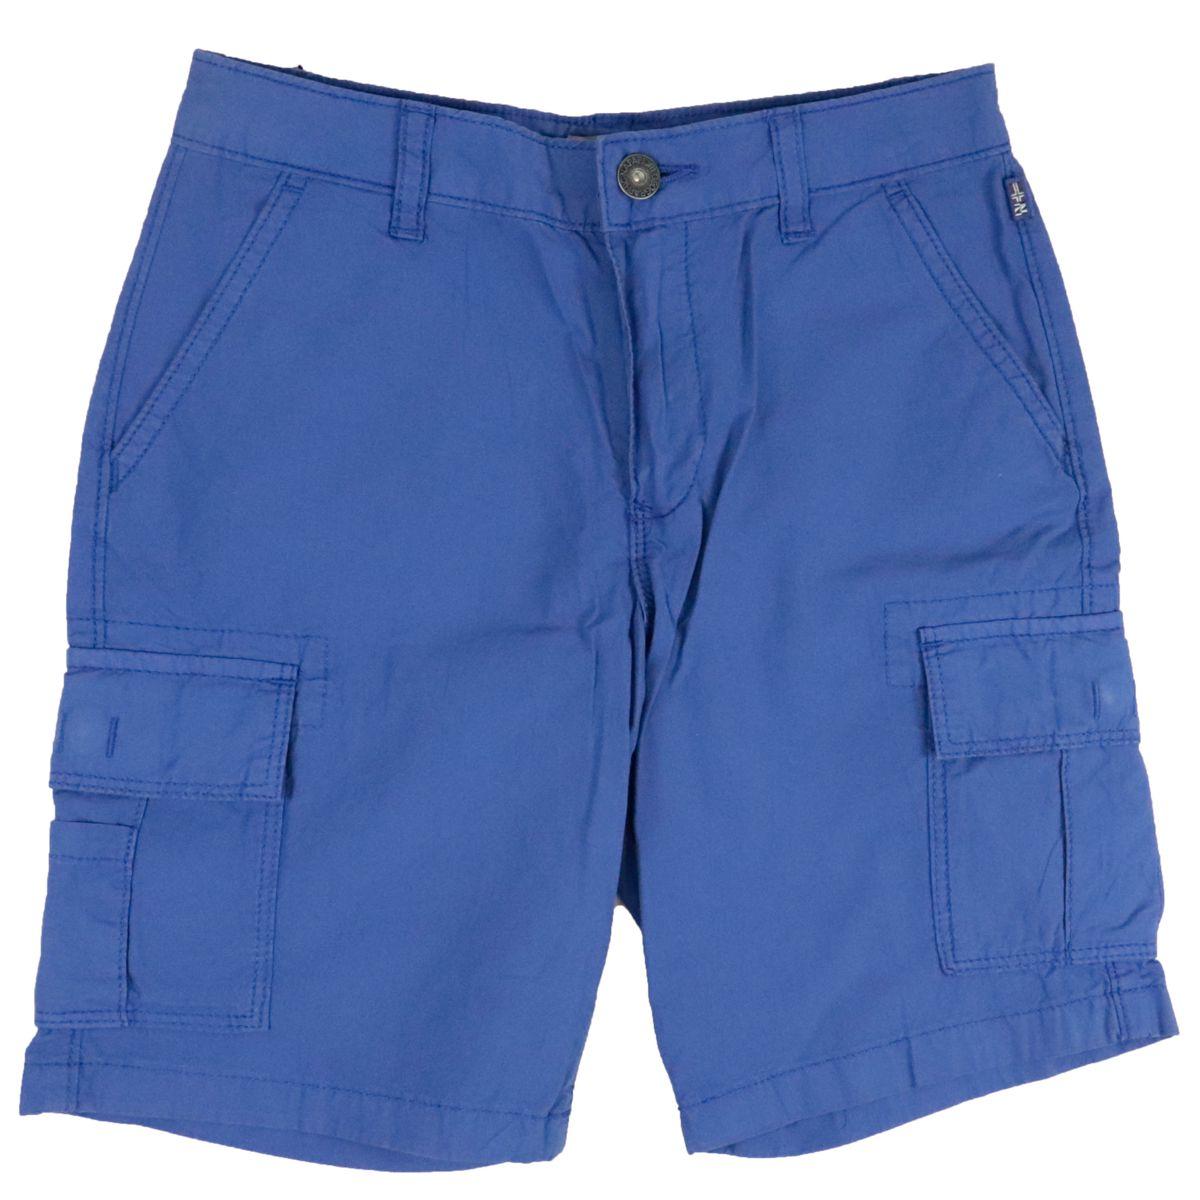 Pantaloncini Noto 2 Bluette NAPAPIJRI